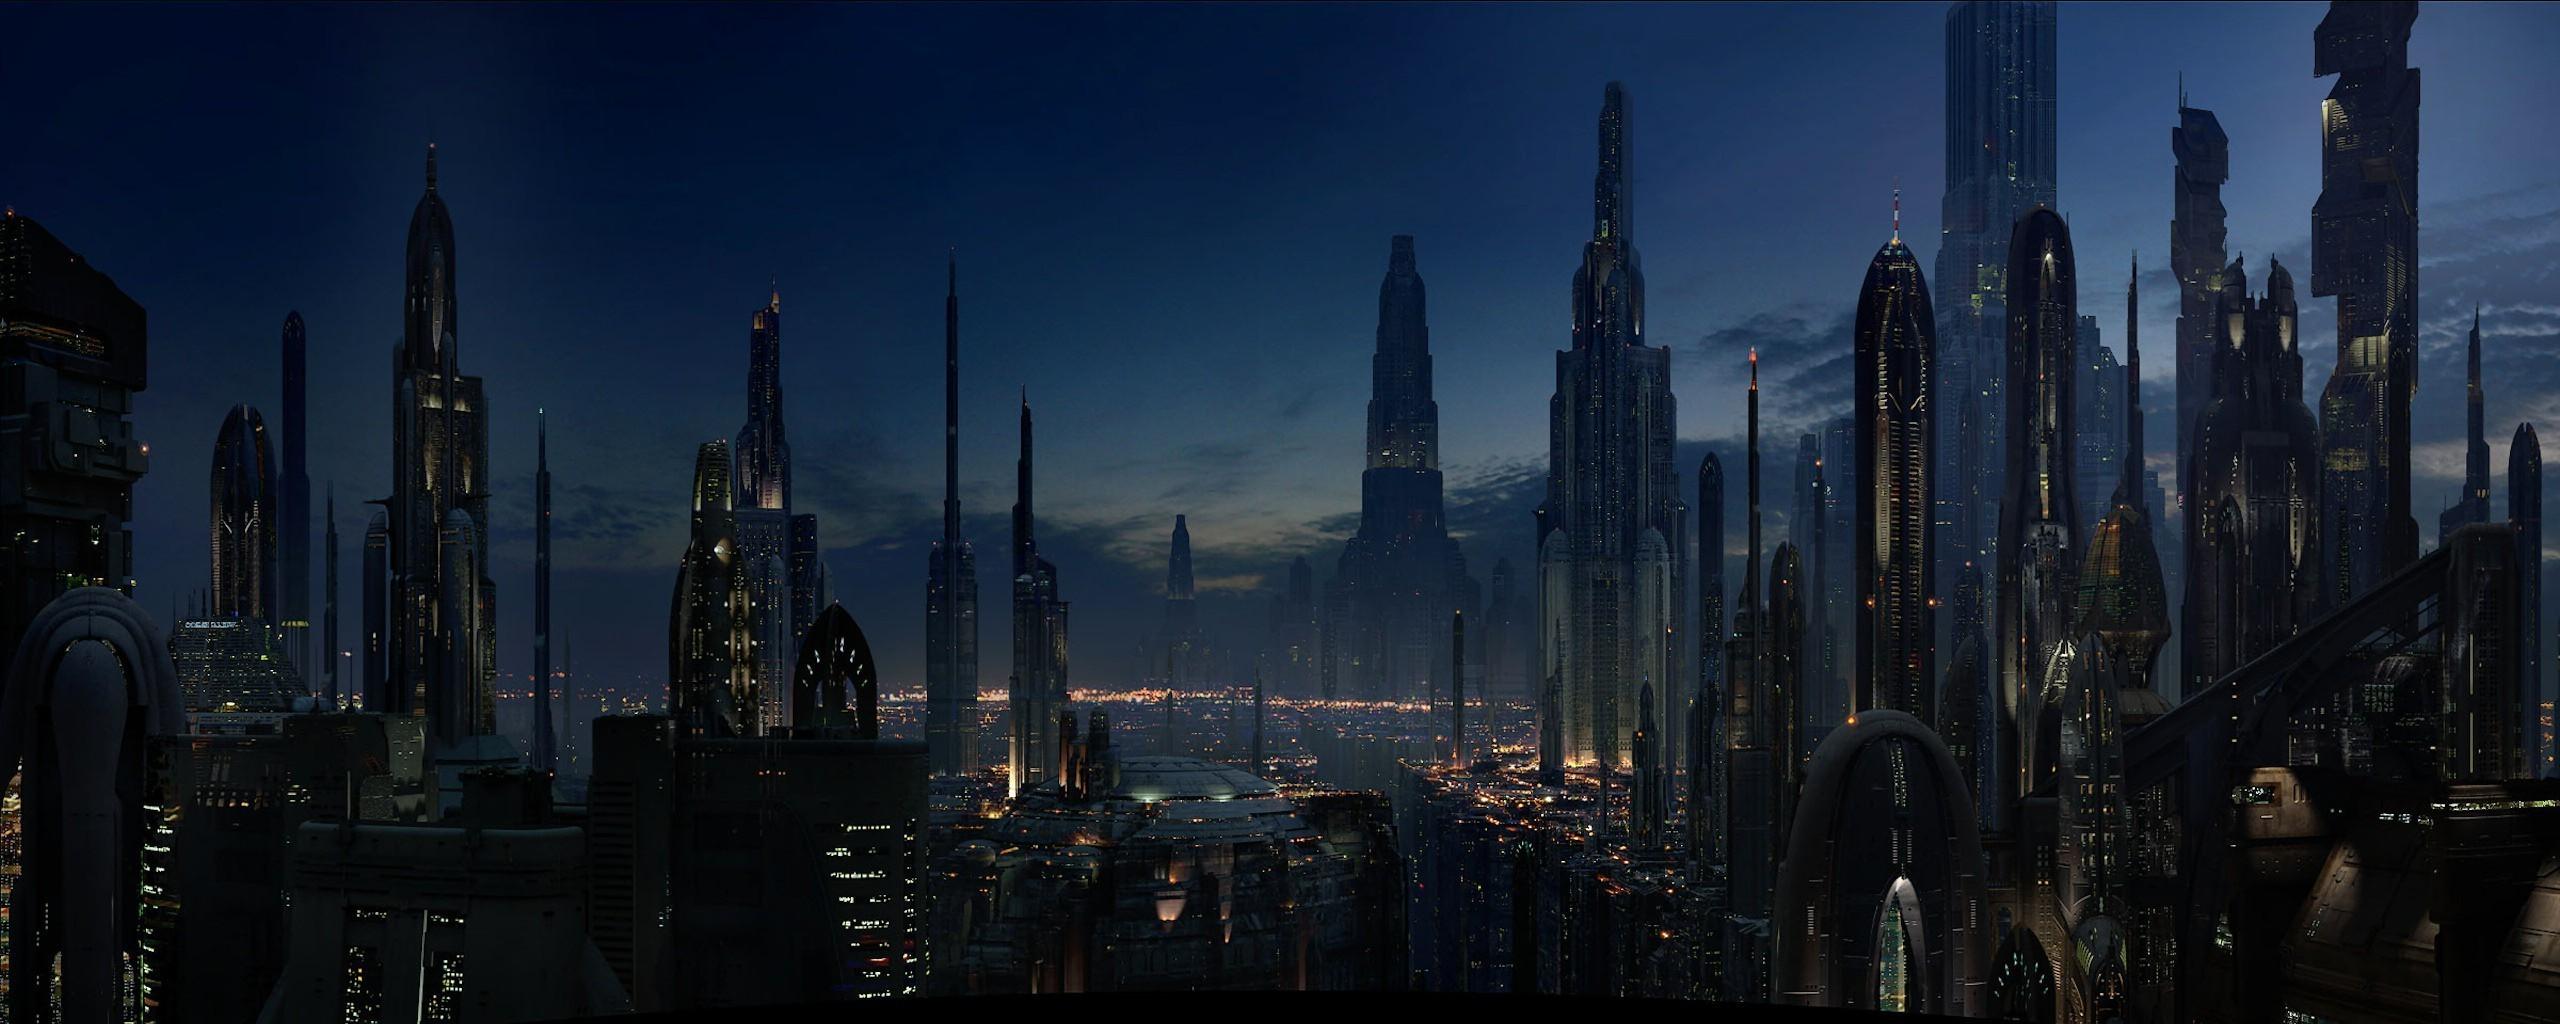 Wonderful Wallpaper High Resolution Sci Fi - landscape-lights-city-cityscape-night-sky-skyline-skyscraper-evening-science-fiction-dusk-metropolis-spire-downtown-darkness-landmark-screenshot-2560x1024-px-urban-area-metropolitan-area-human-settlement-704529  Image_82591.jpg